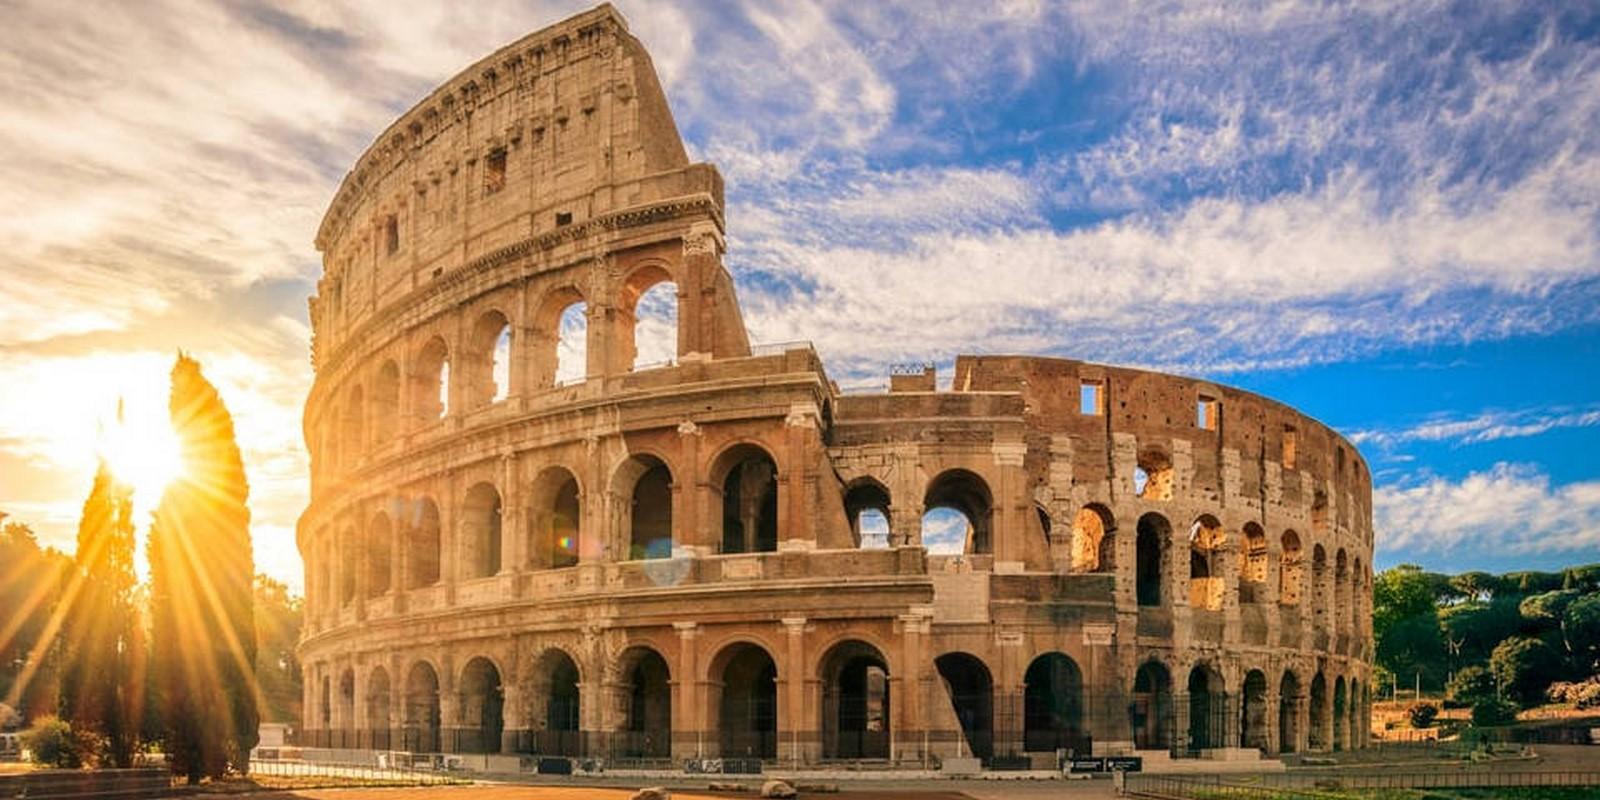 The Colosseum - Sheet1